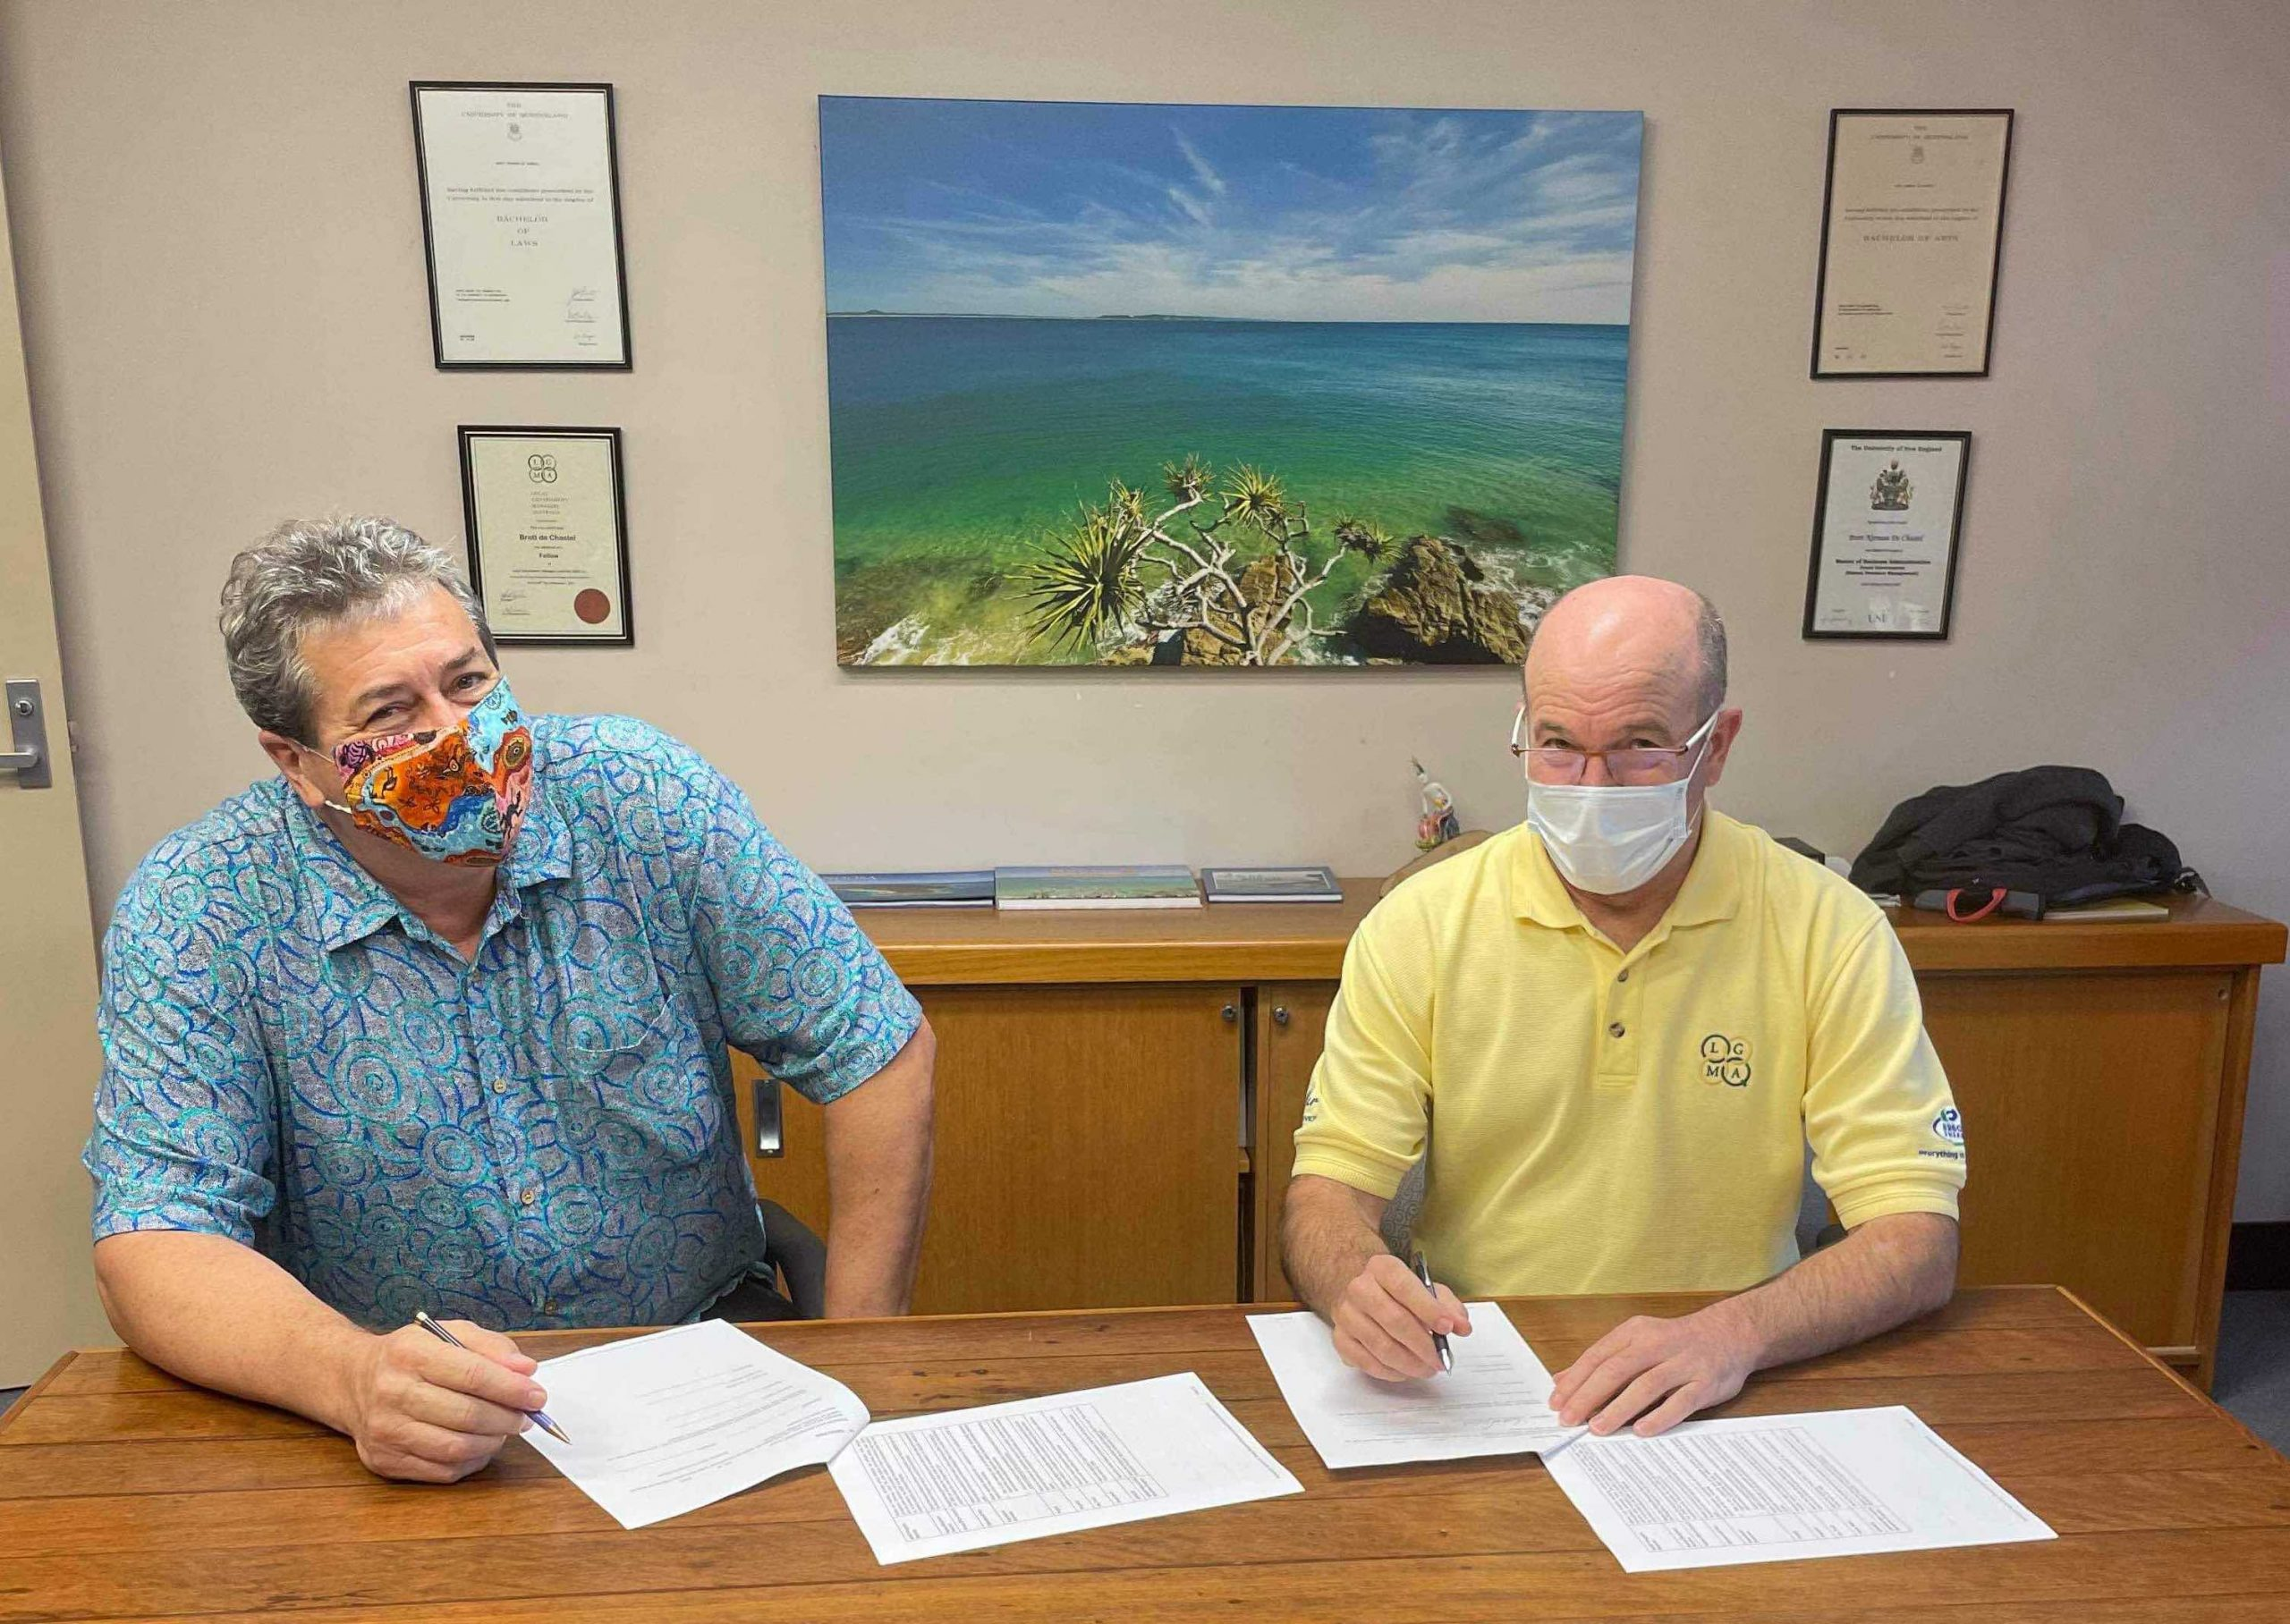 rex halverson chair nbrf signs partnership with brett de chastel ceo noosa council